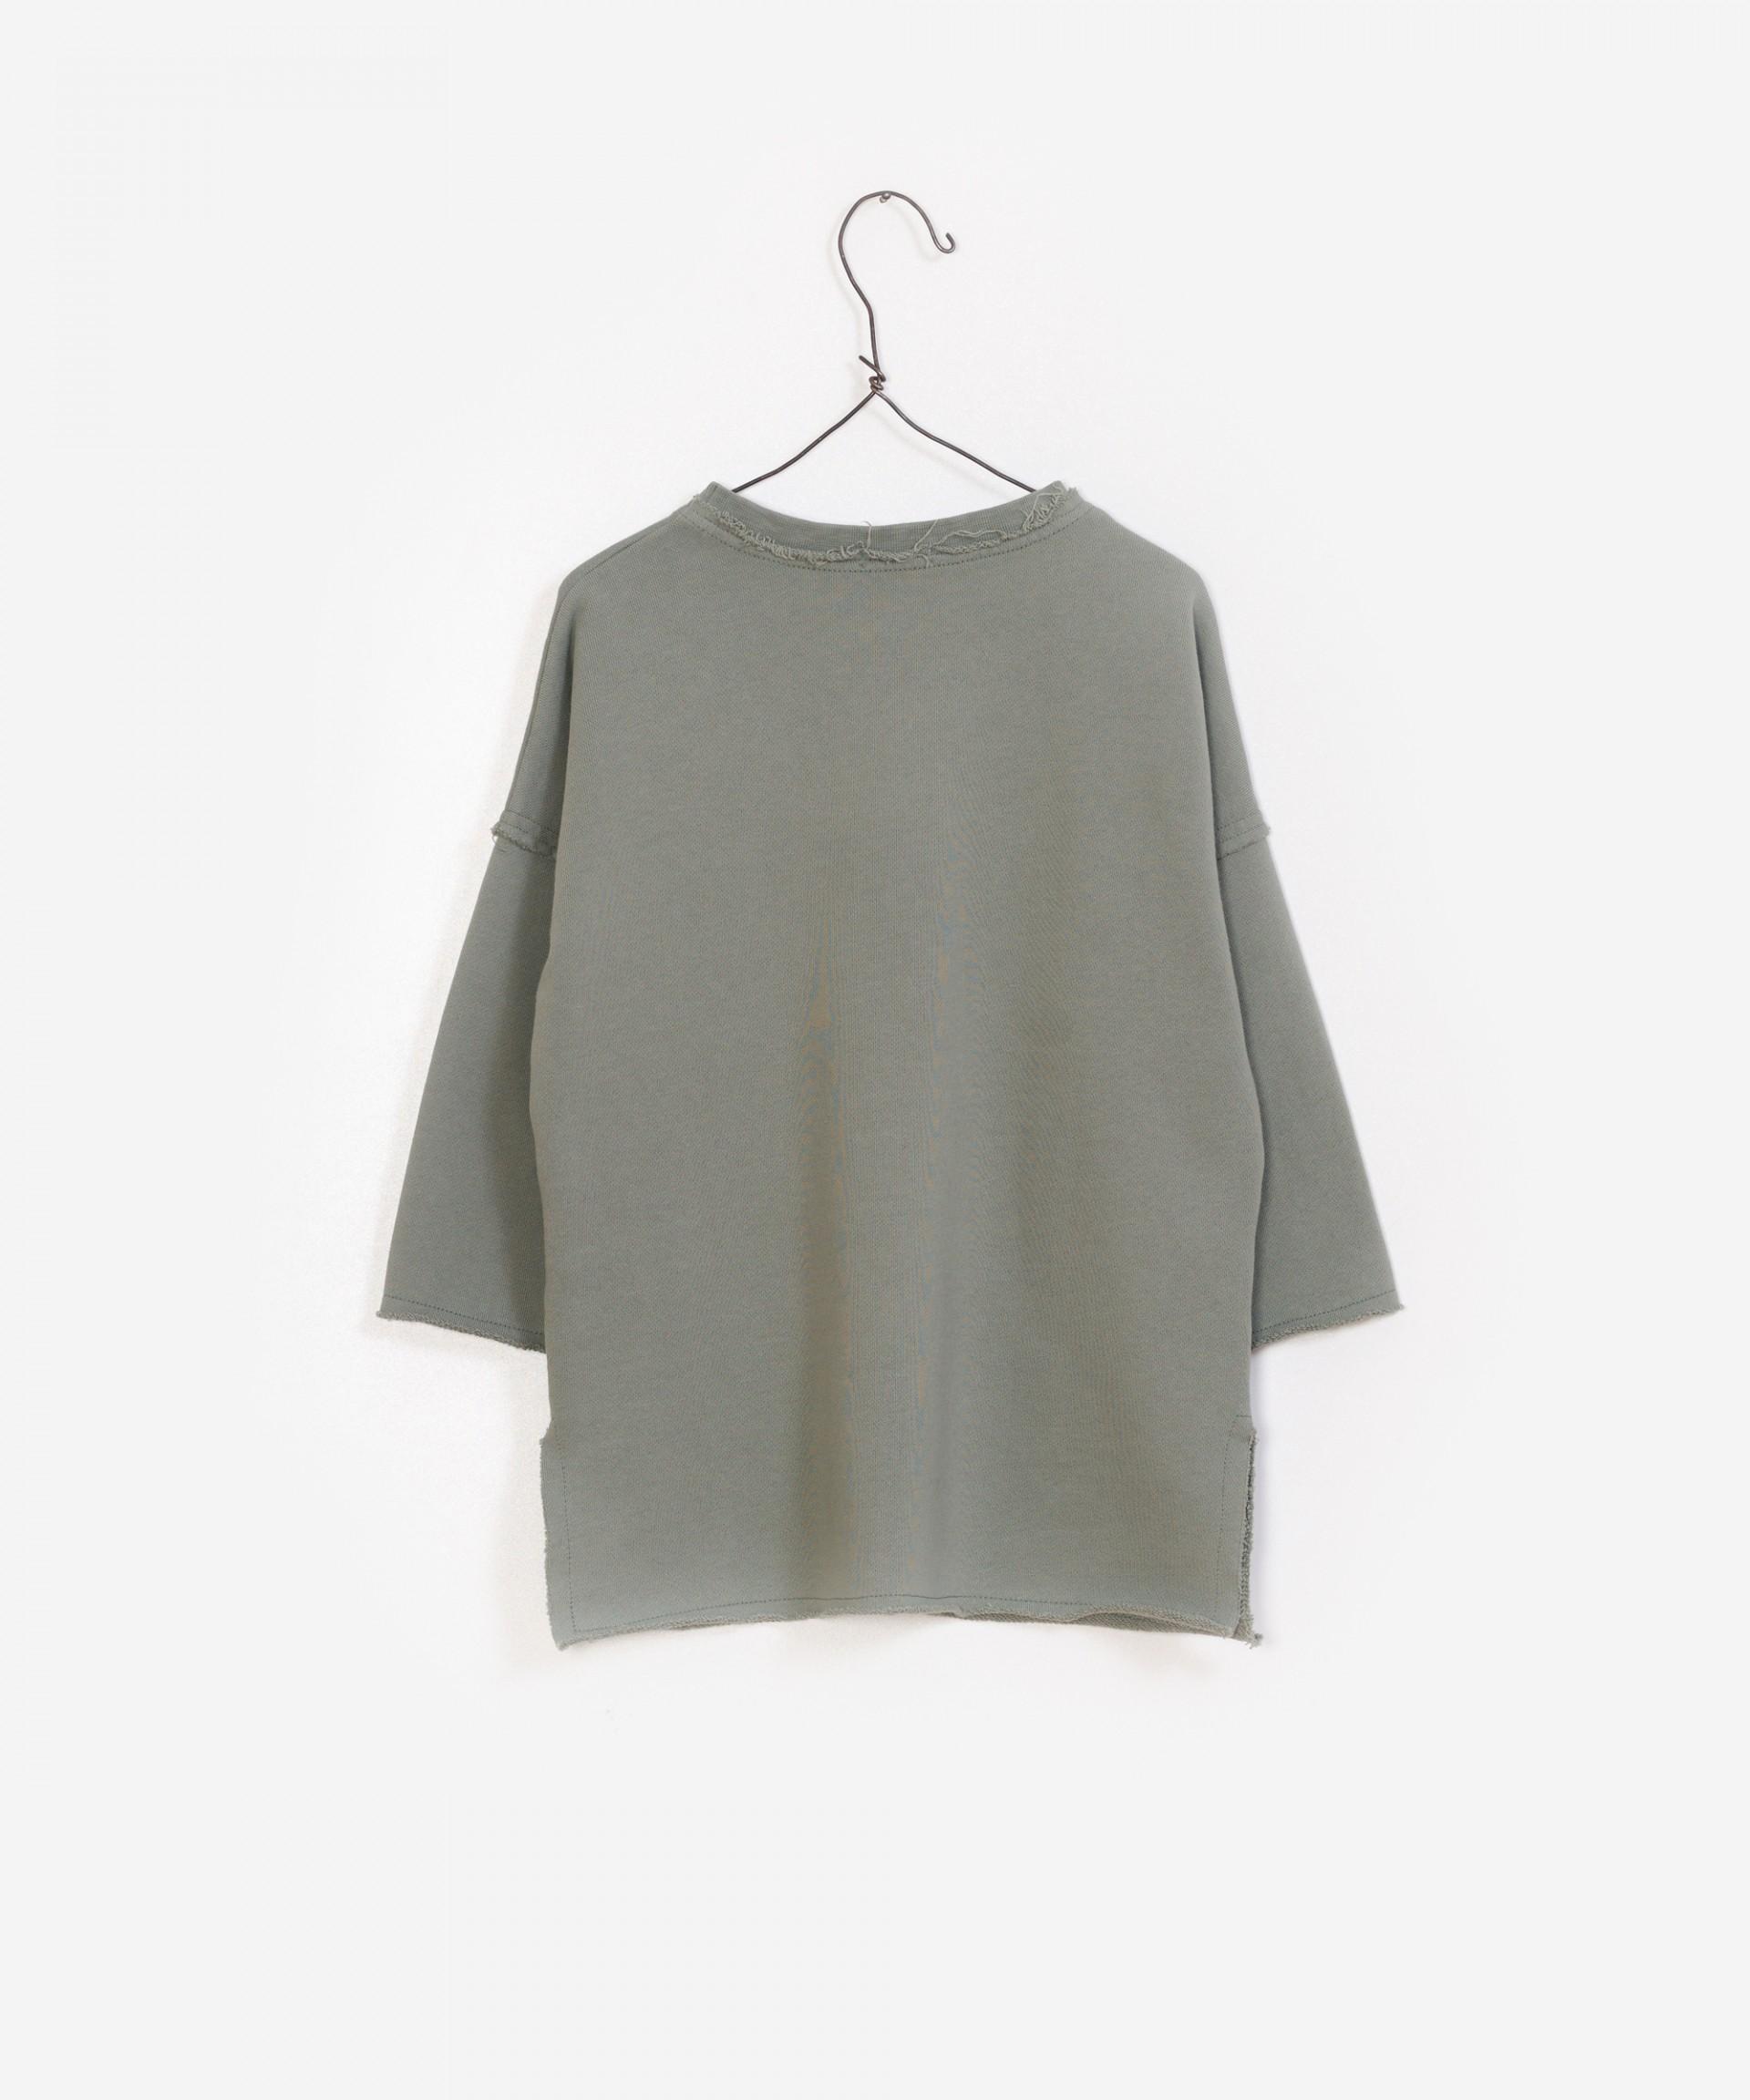 Vestido felpa 100% algodón orgánico